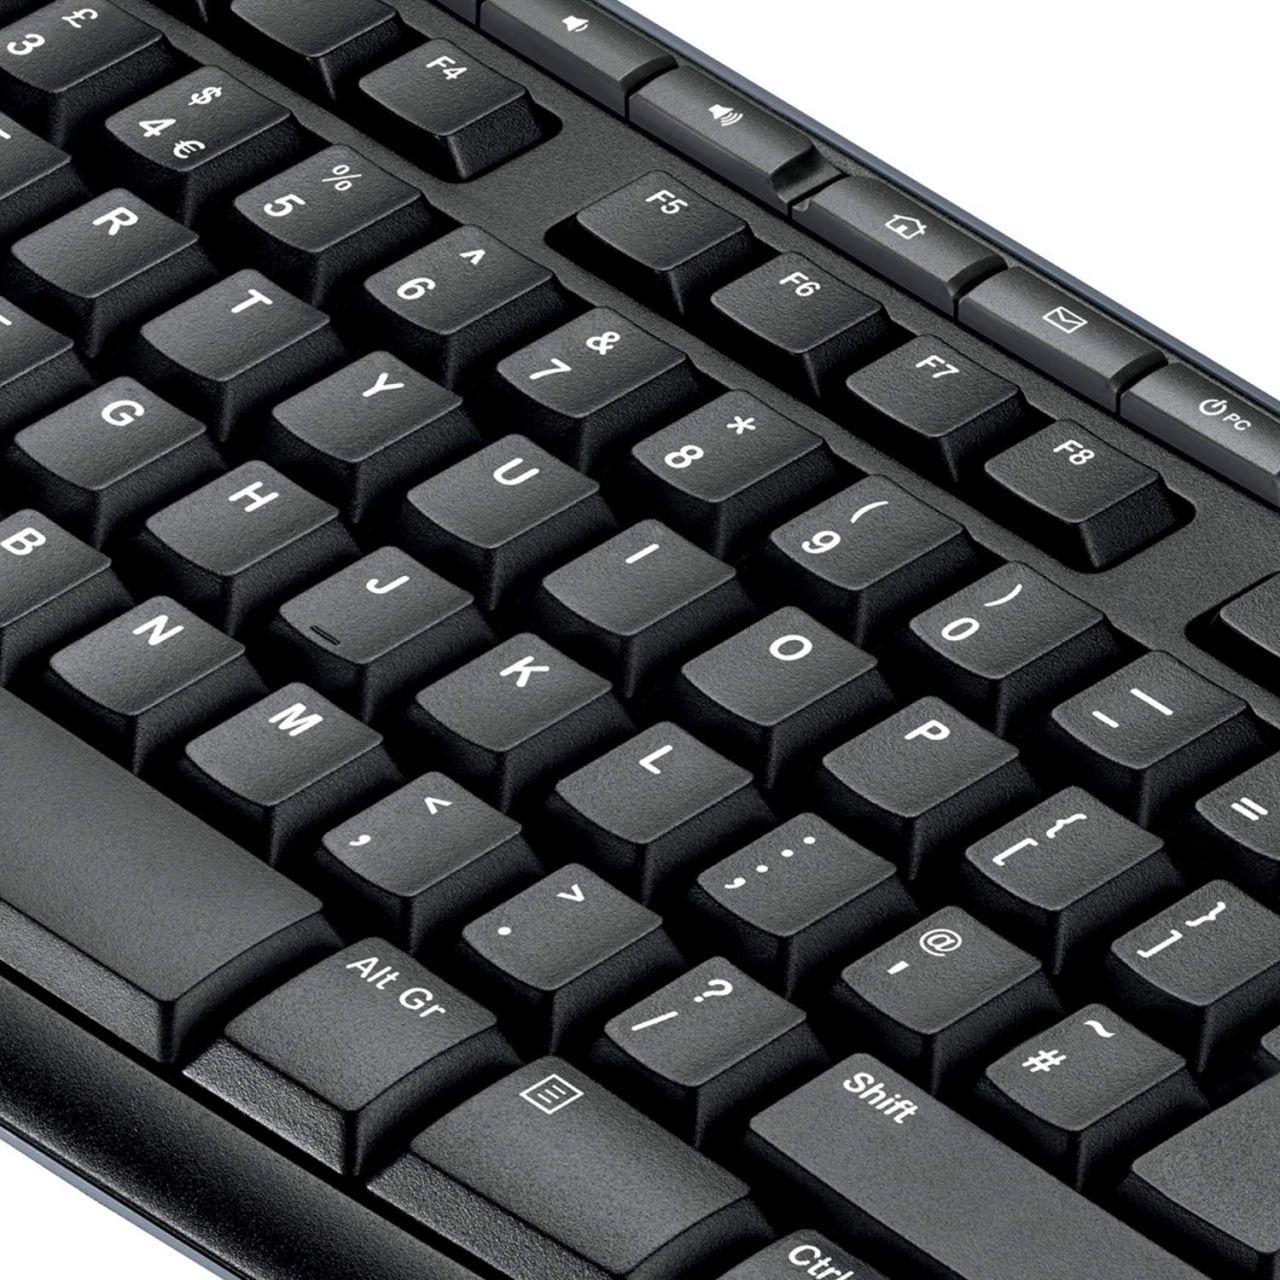 100 TL altı en iyi klavyeler! - Page 1